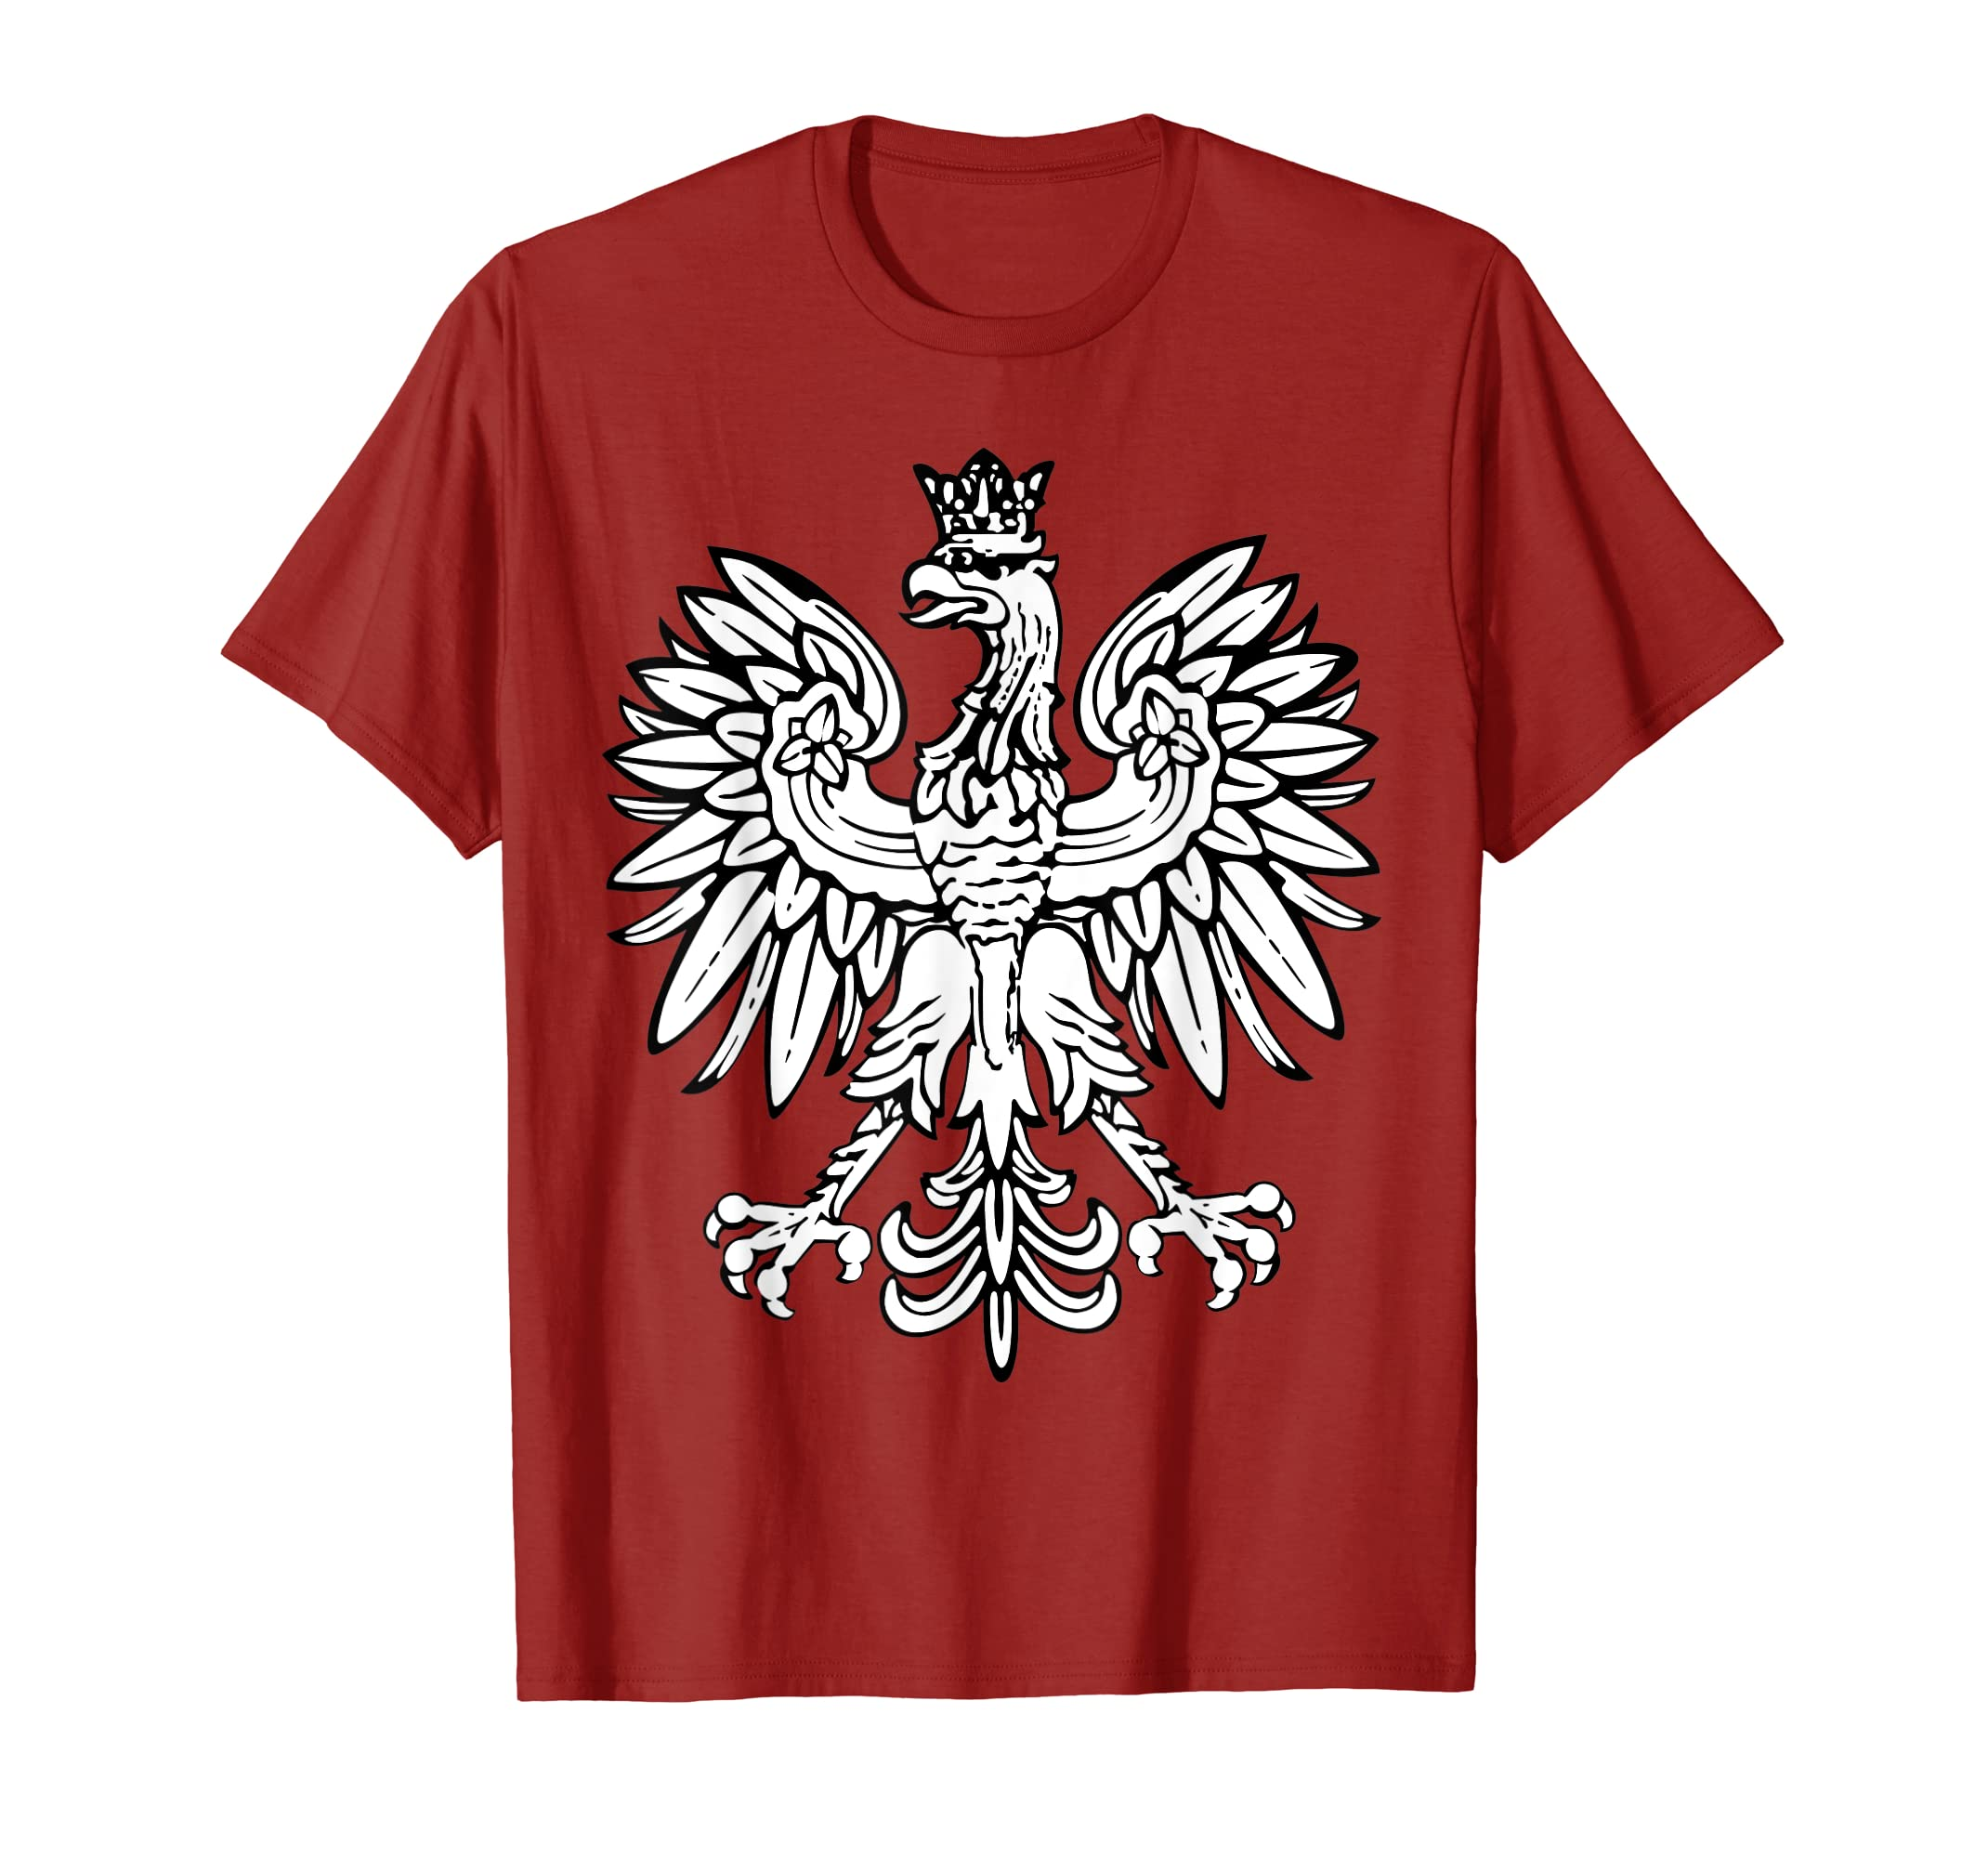 748bc95bafcf Amazon.com: Eagle Polish Pride Shirt Poland Dyngus Day Buffalo: Clothing